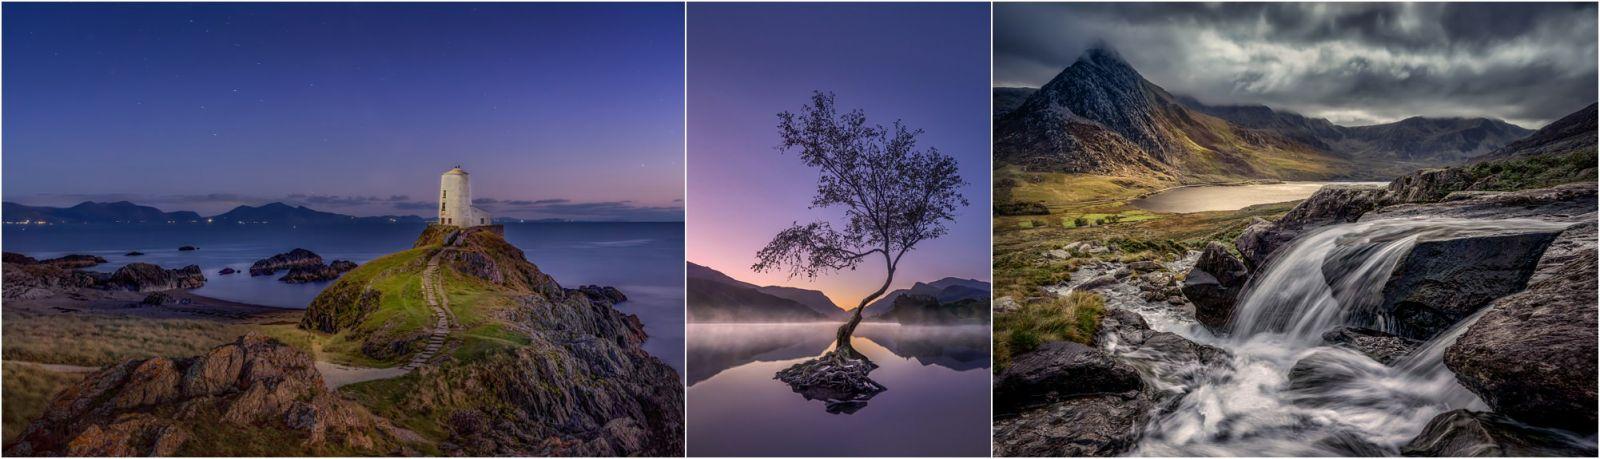 Snowdonia landscape Photography Workshop